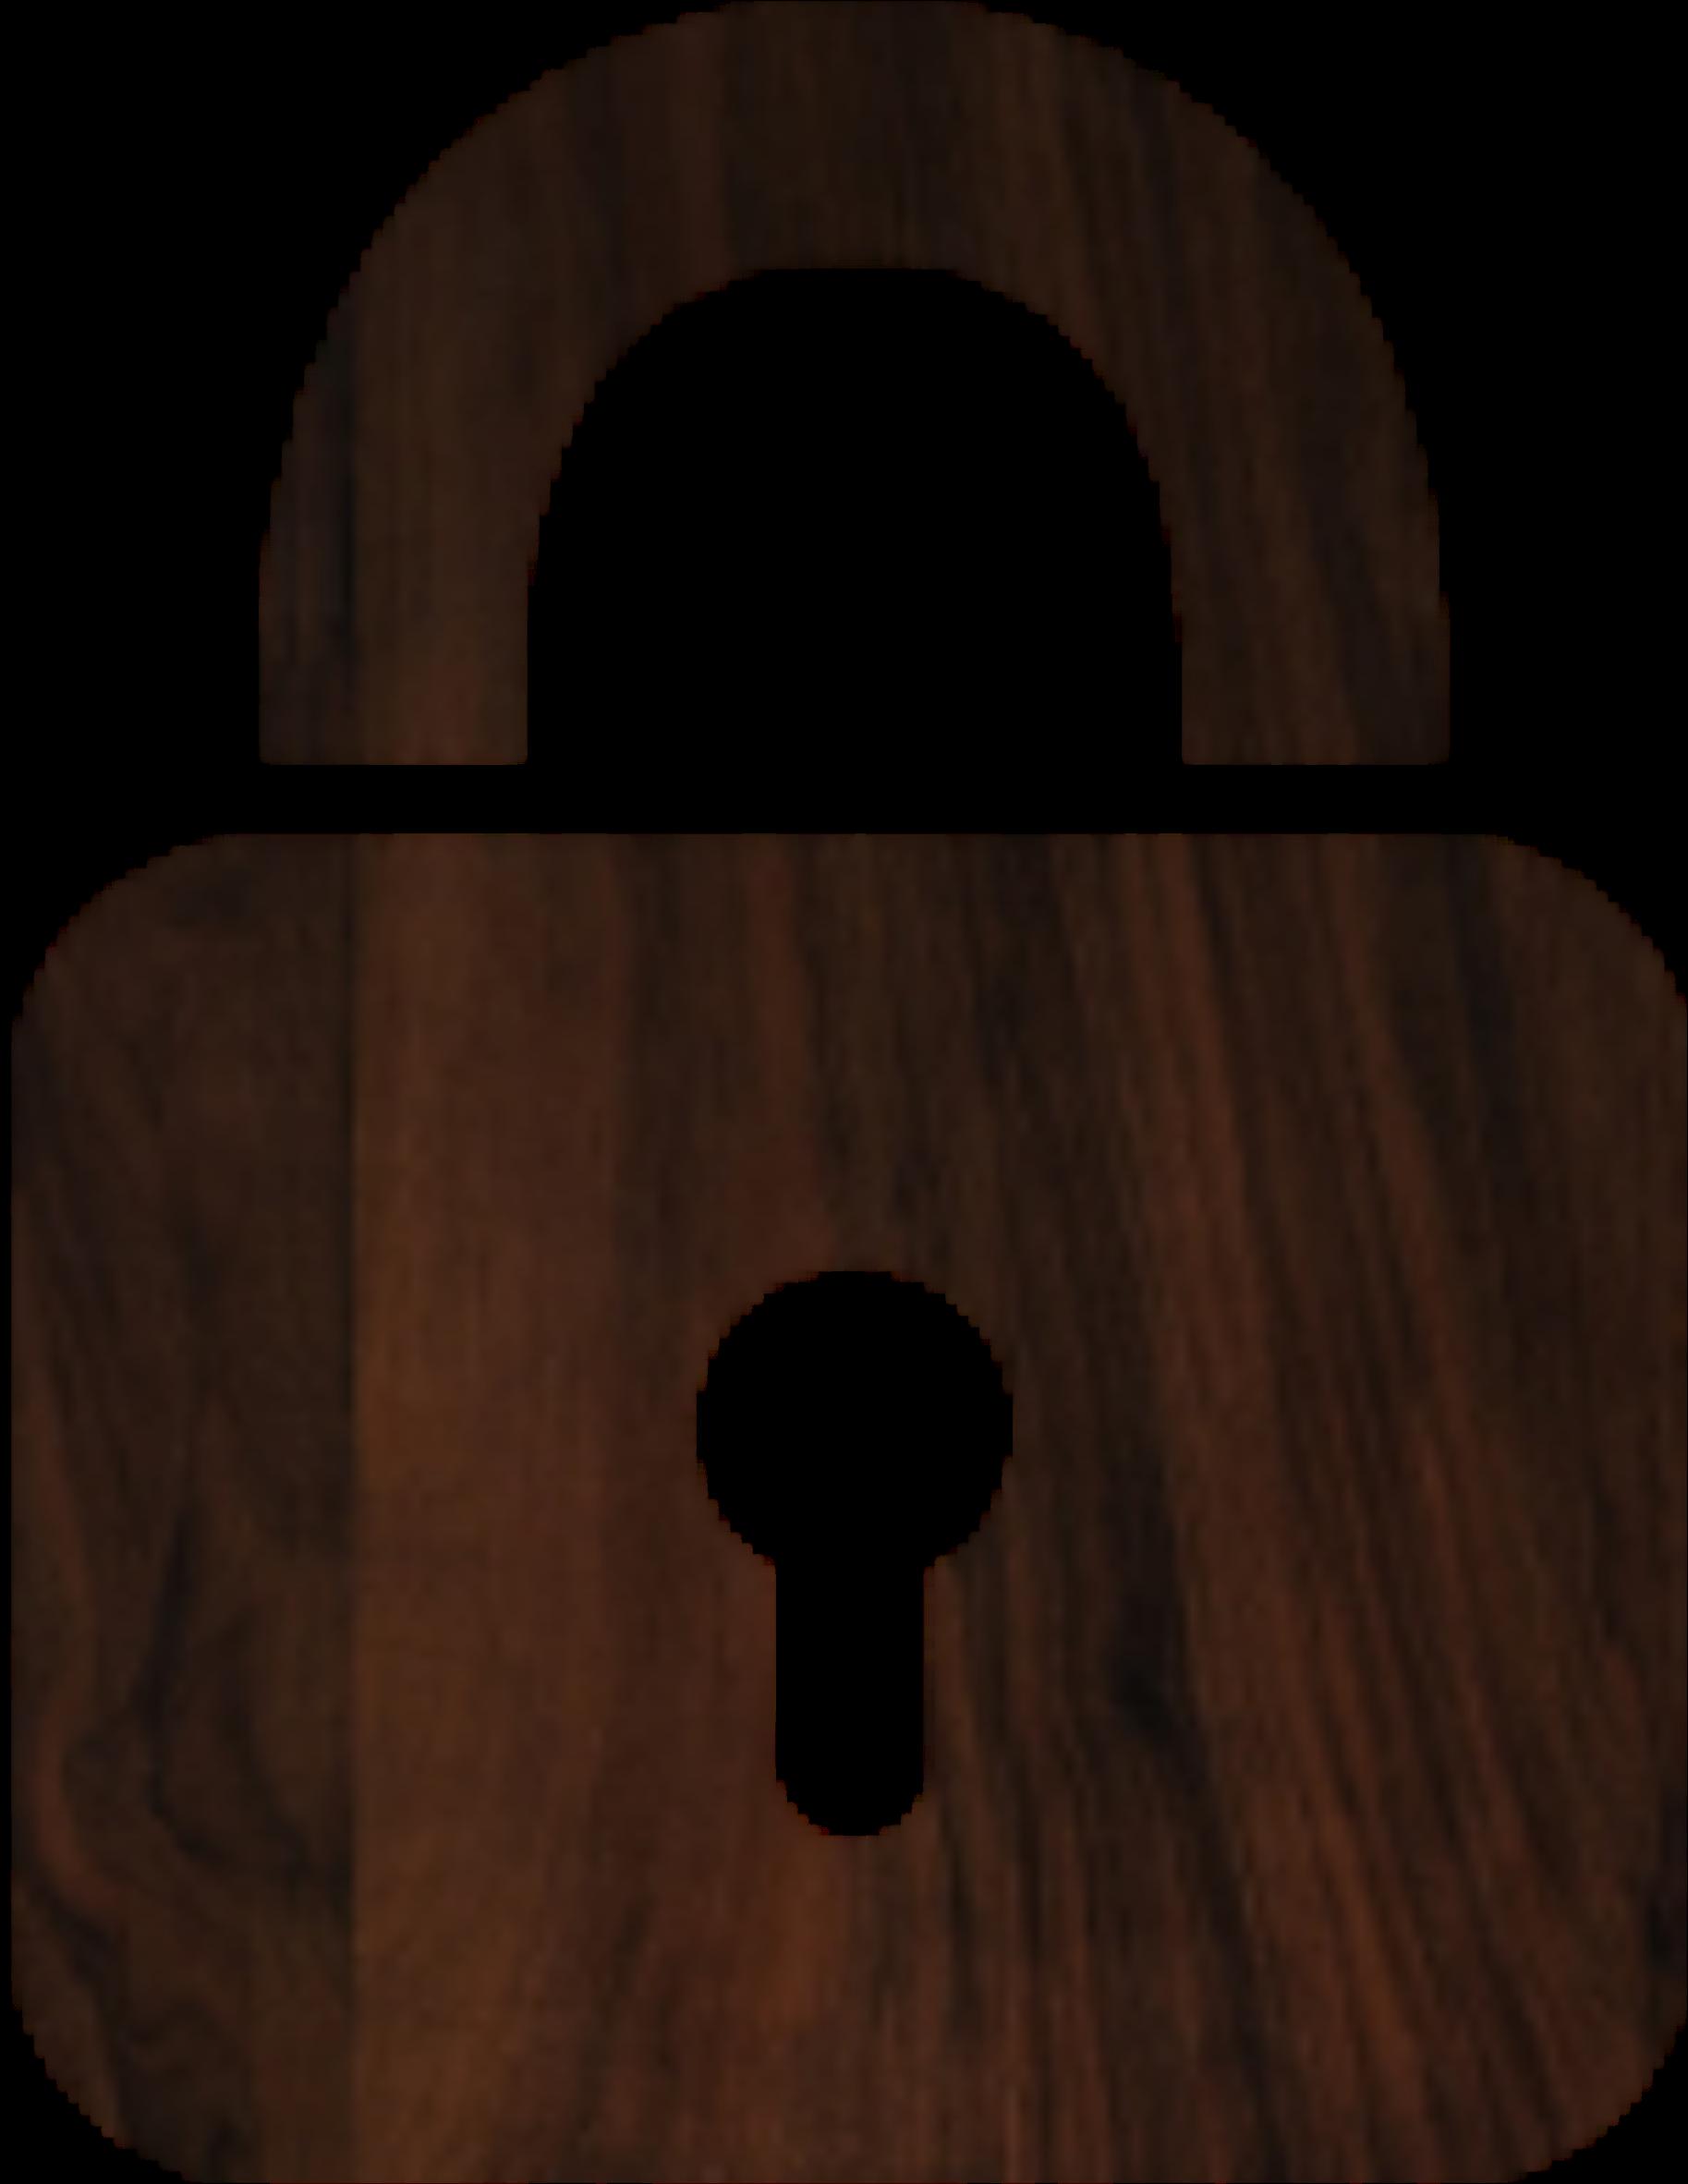 Wood big image png. Lock clipart outline